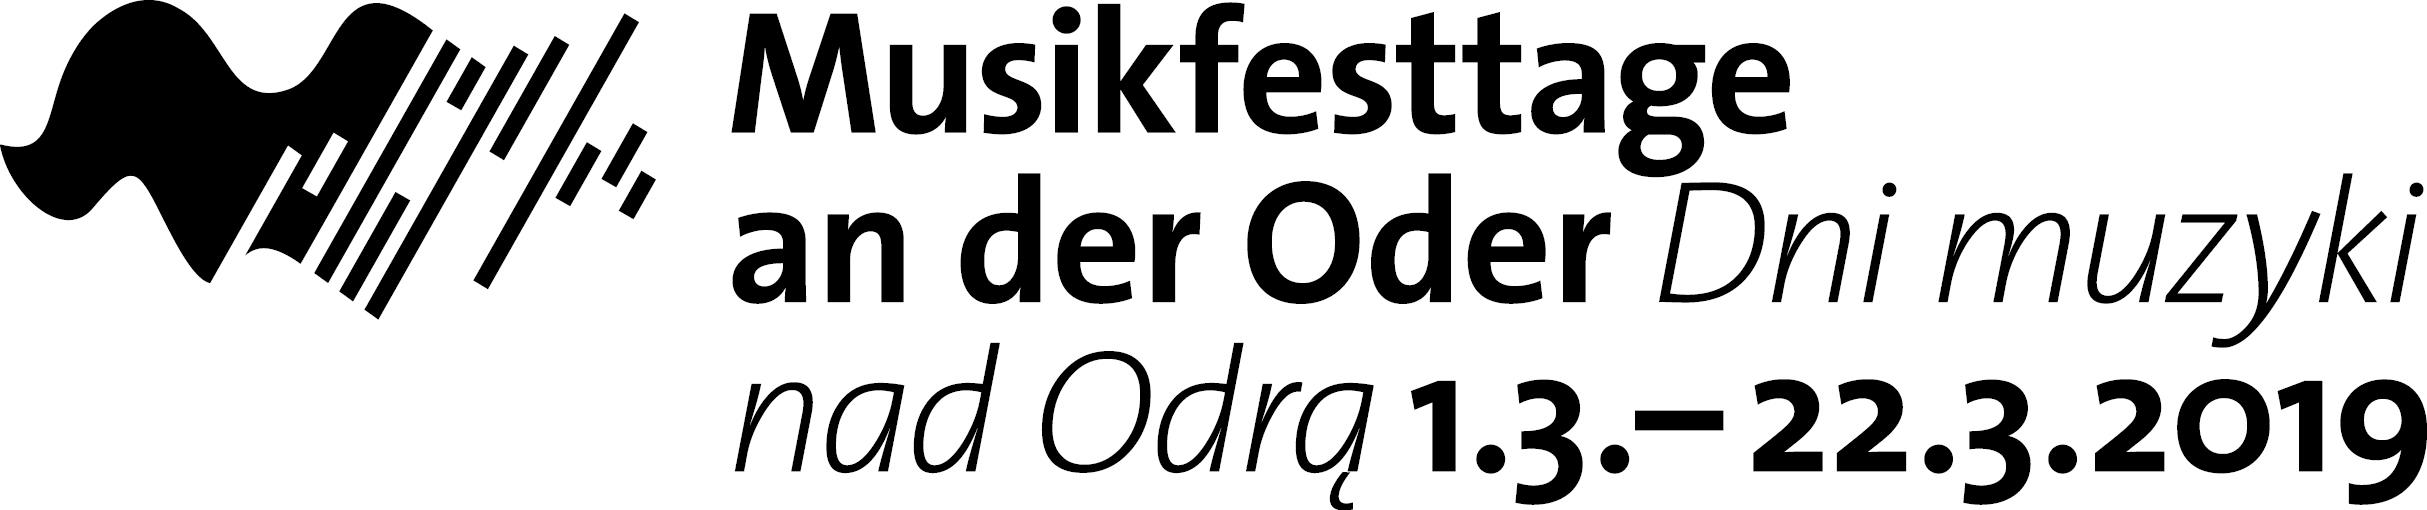 Logo Musikfesttage 2019